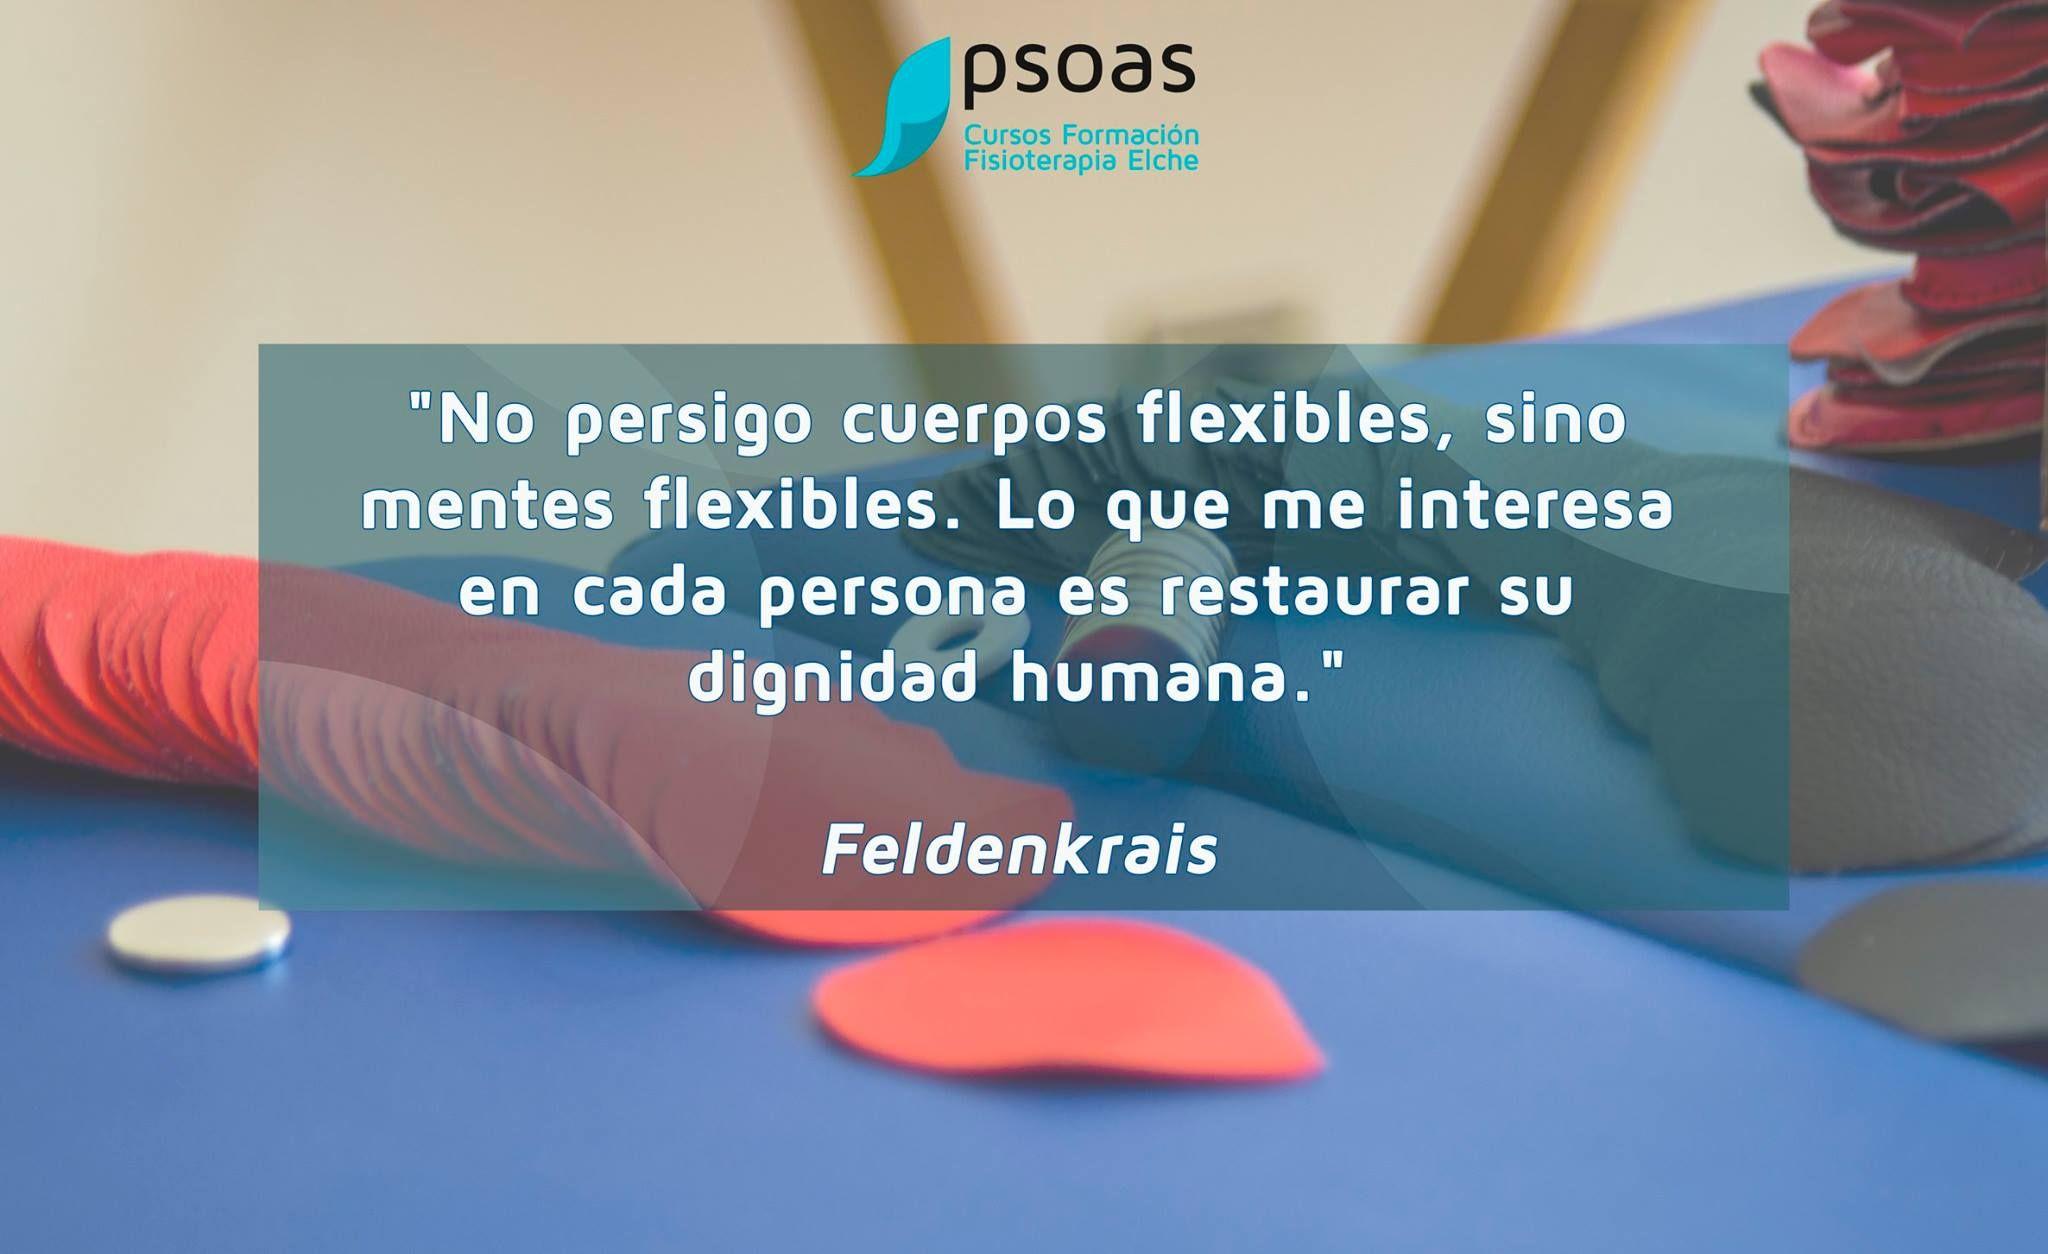 No persigo cuerpos flexibles sino mentes flexibles #osteopatia #fisioterapia